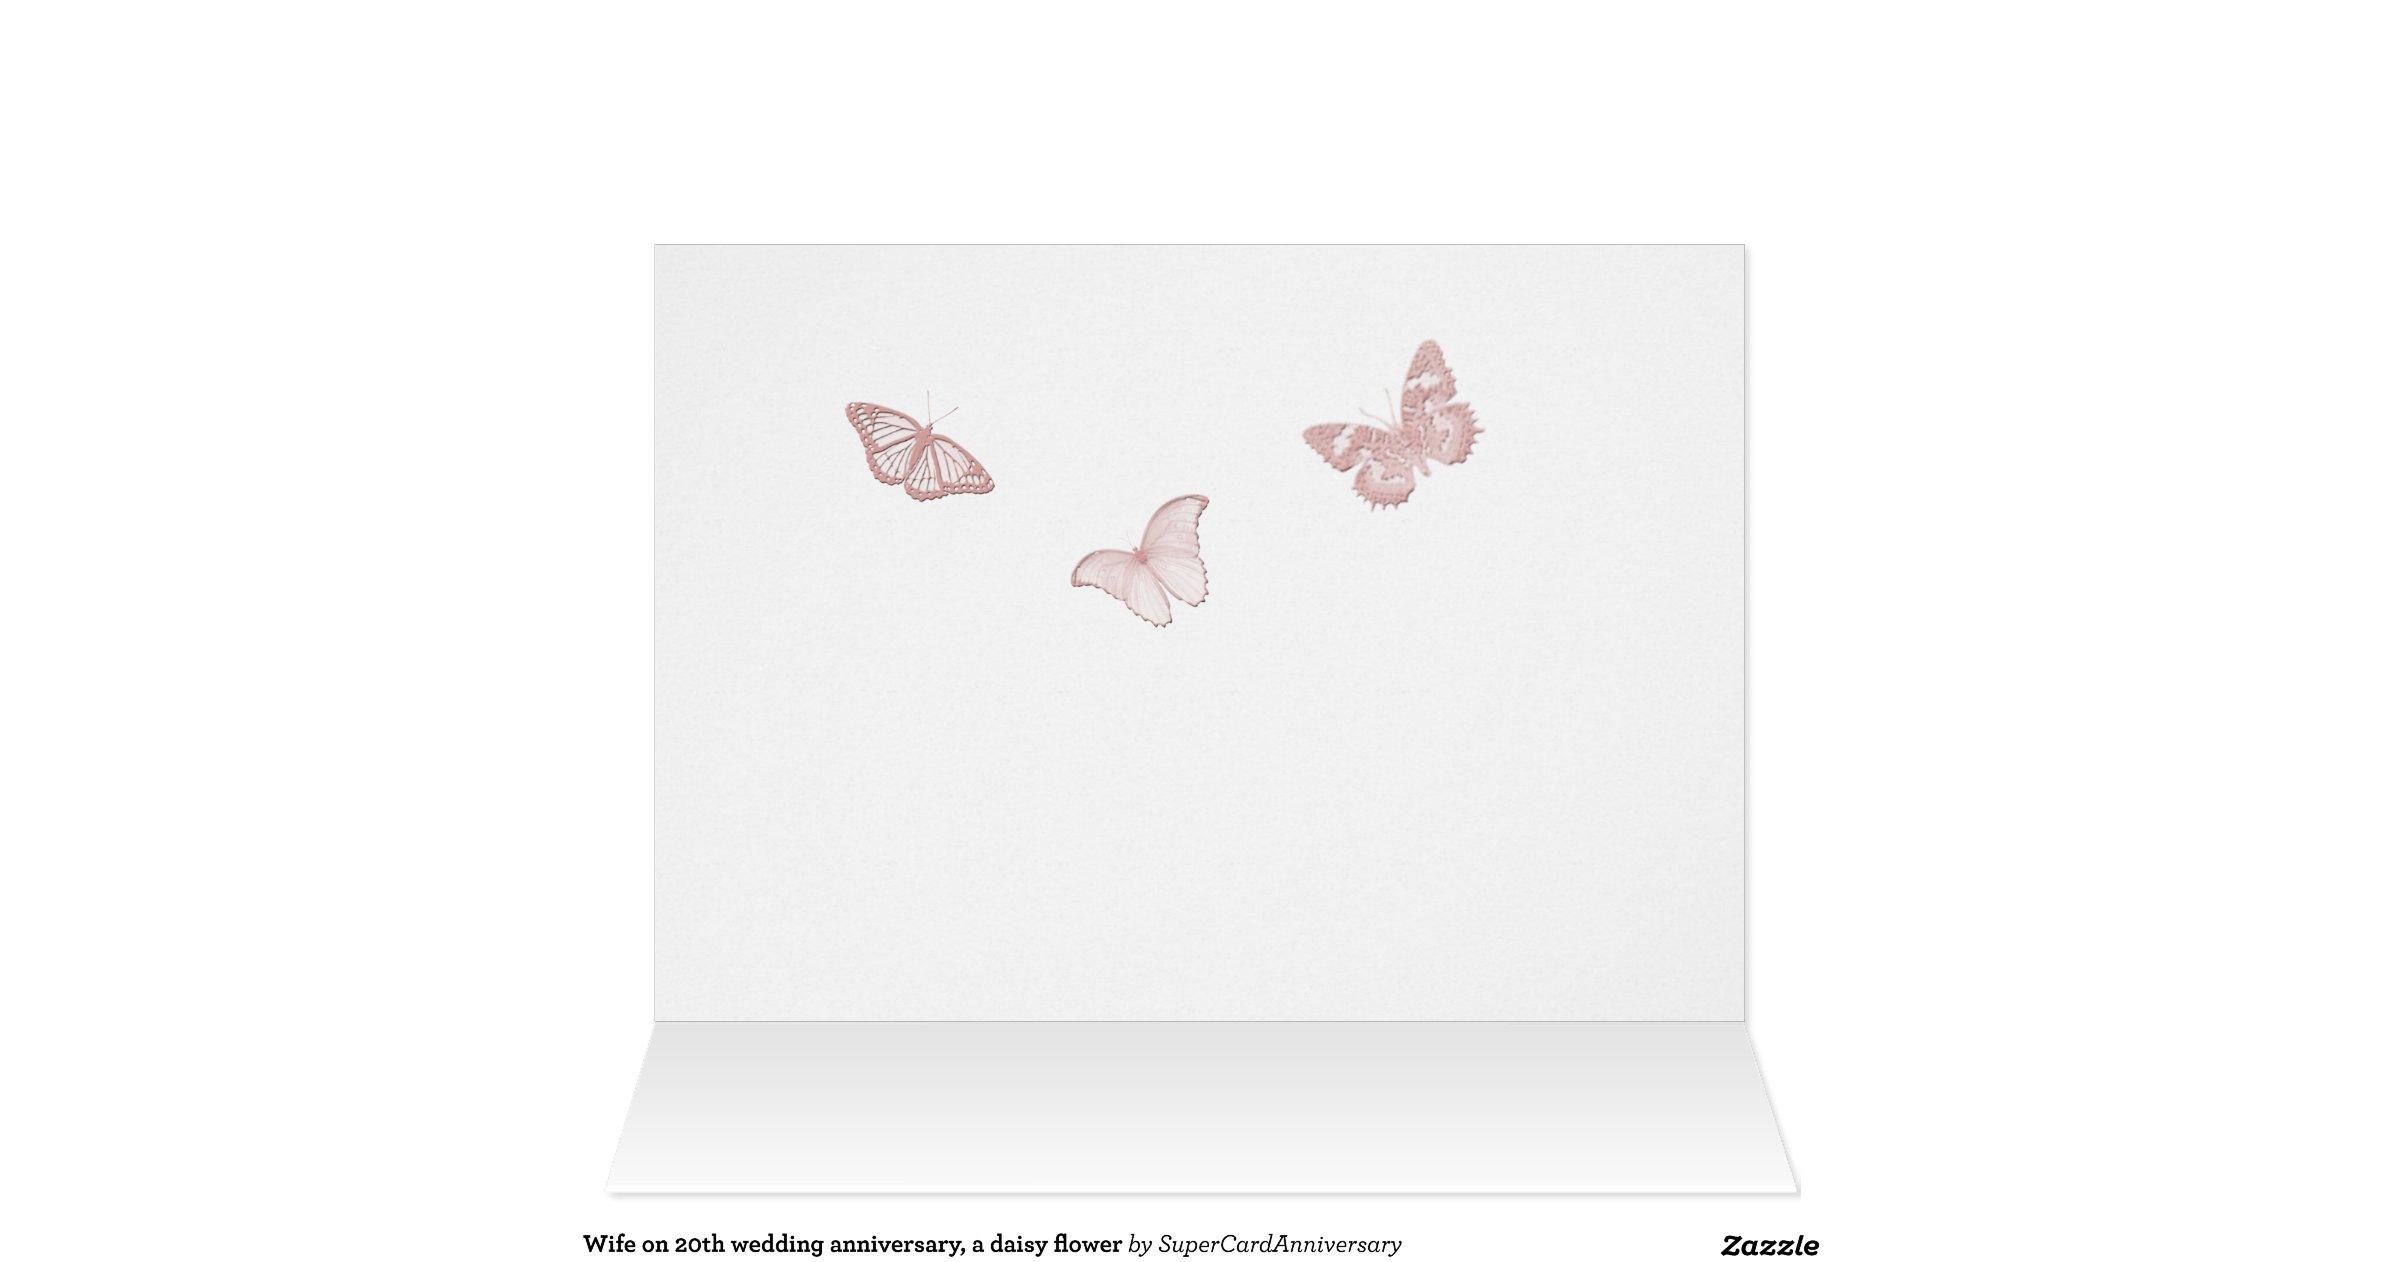 Astounding 20th Wedding Anniversary Flower Pics Design Ideas – Dievoon